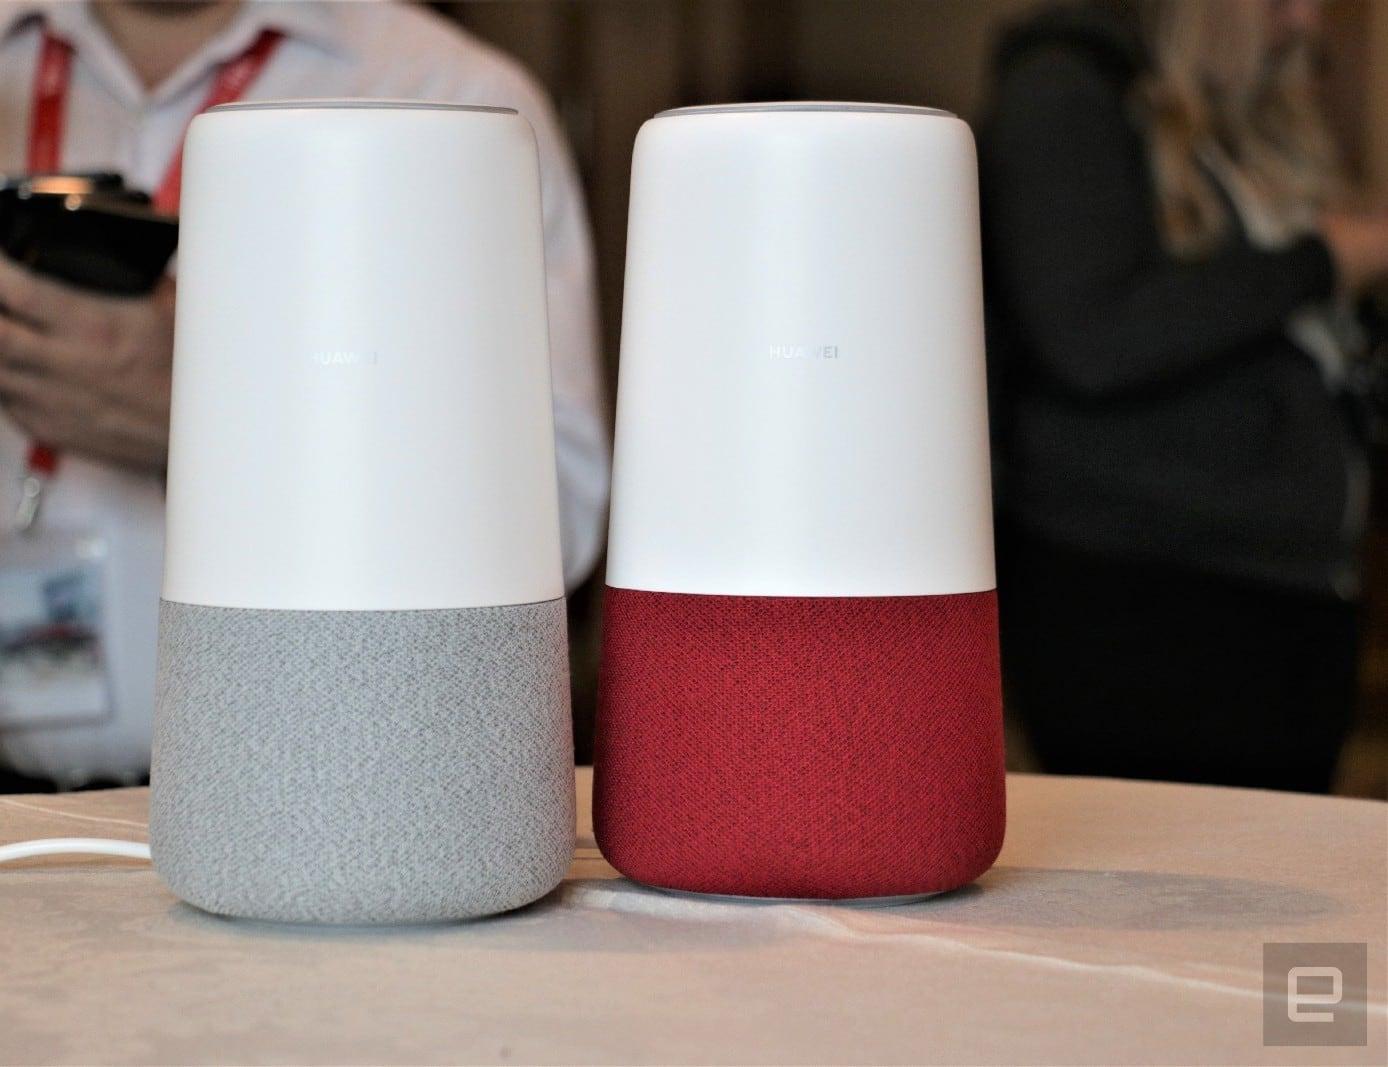 Huawei AI Cube Alexa Smart Speaker